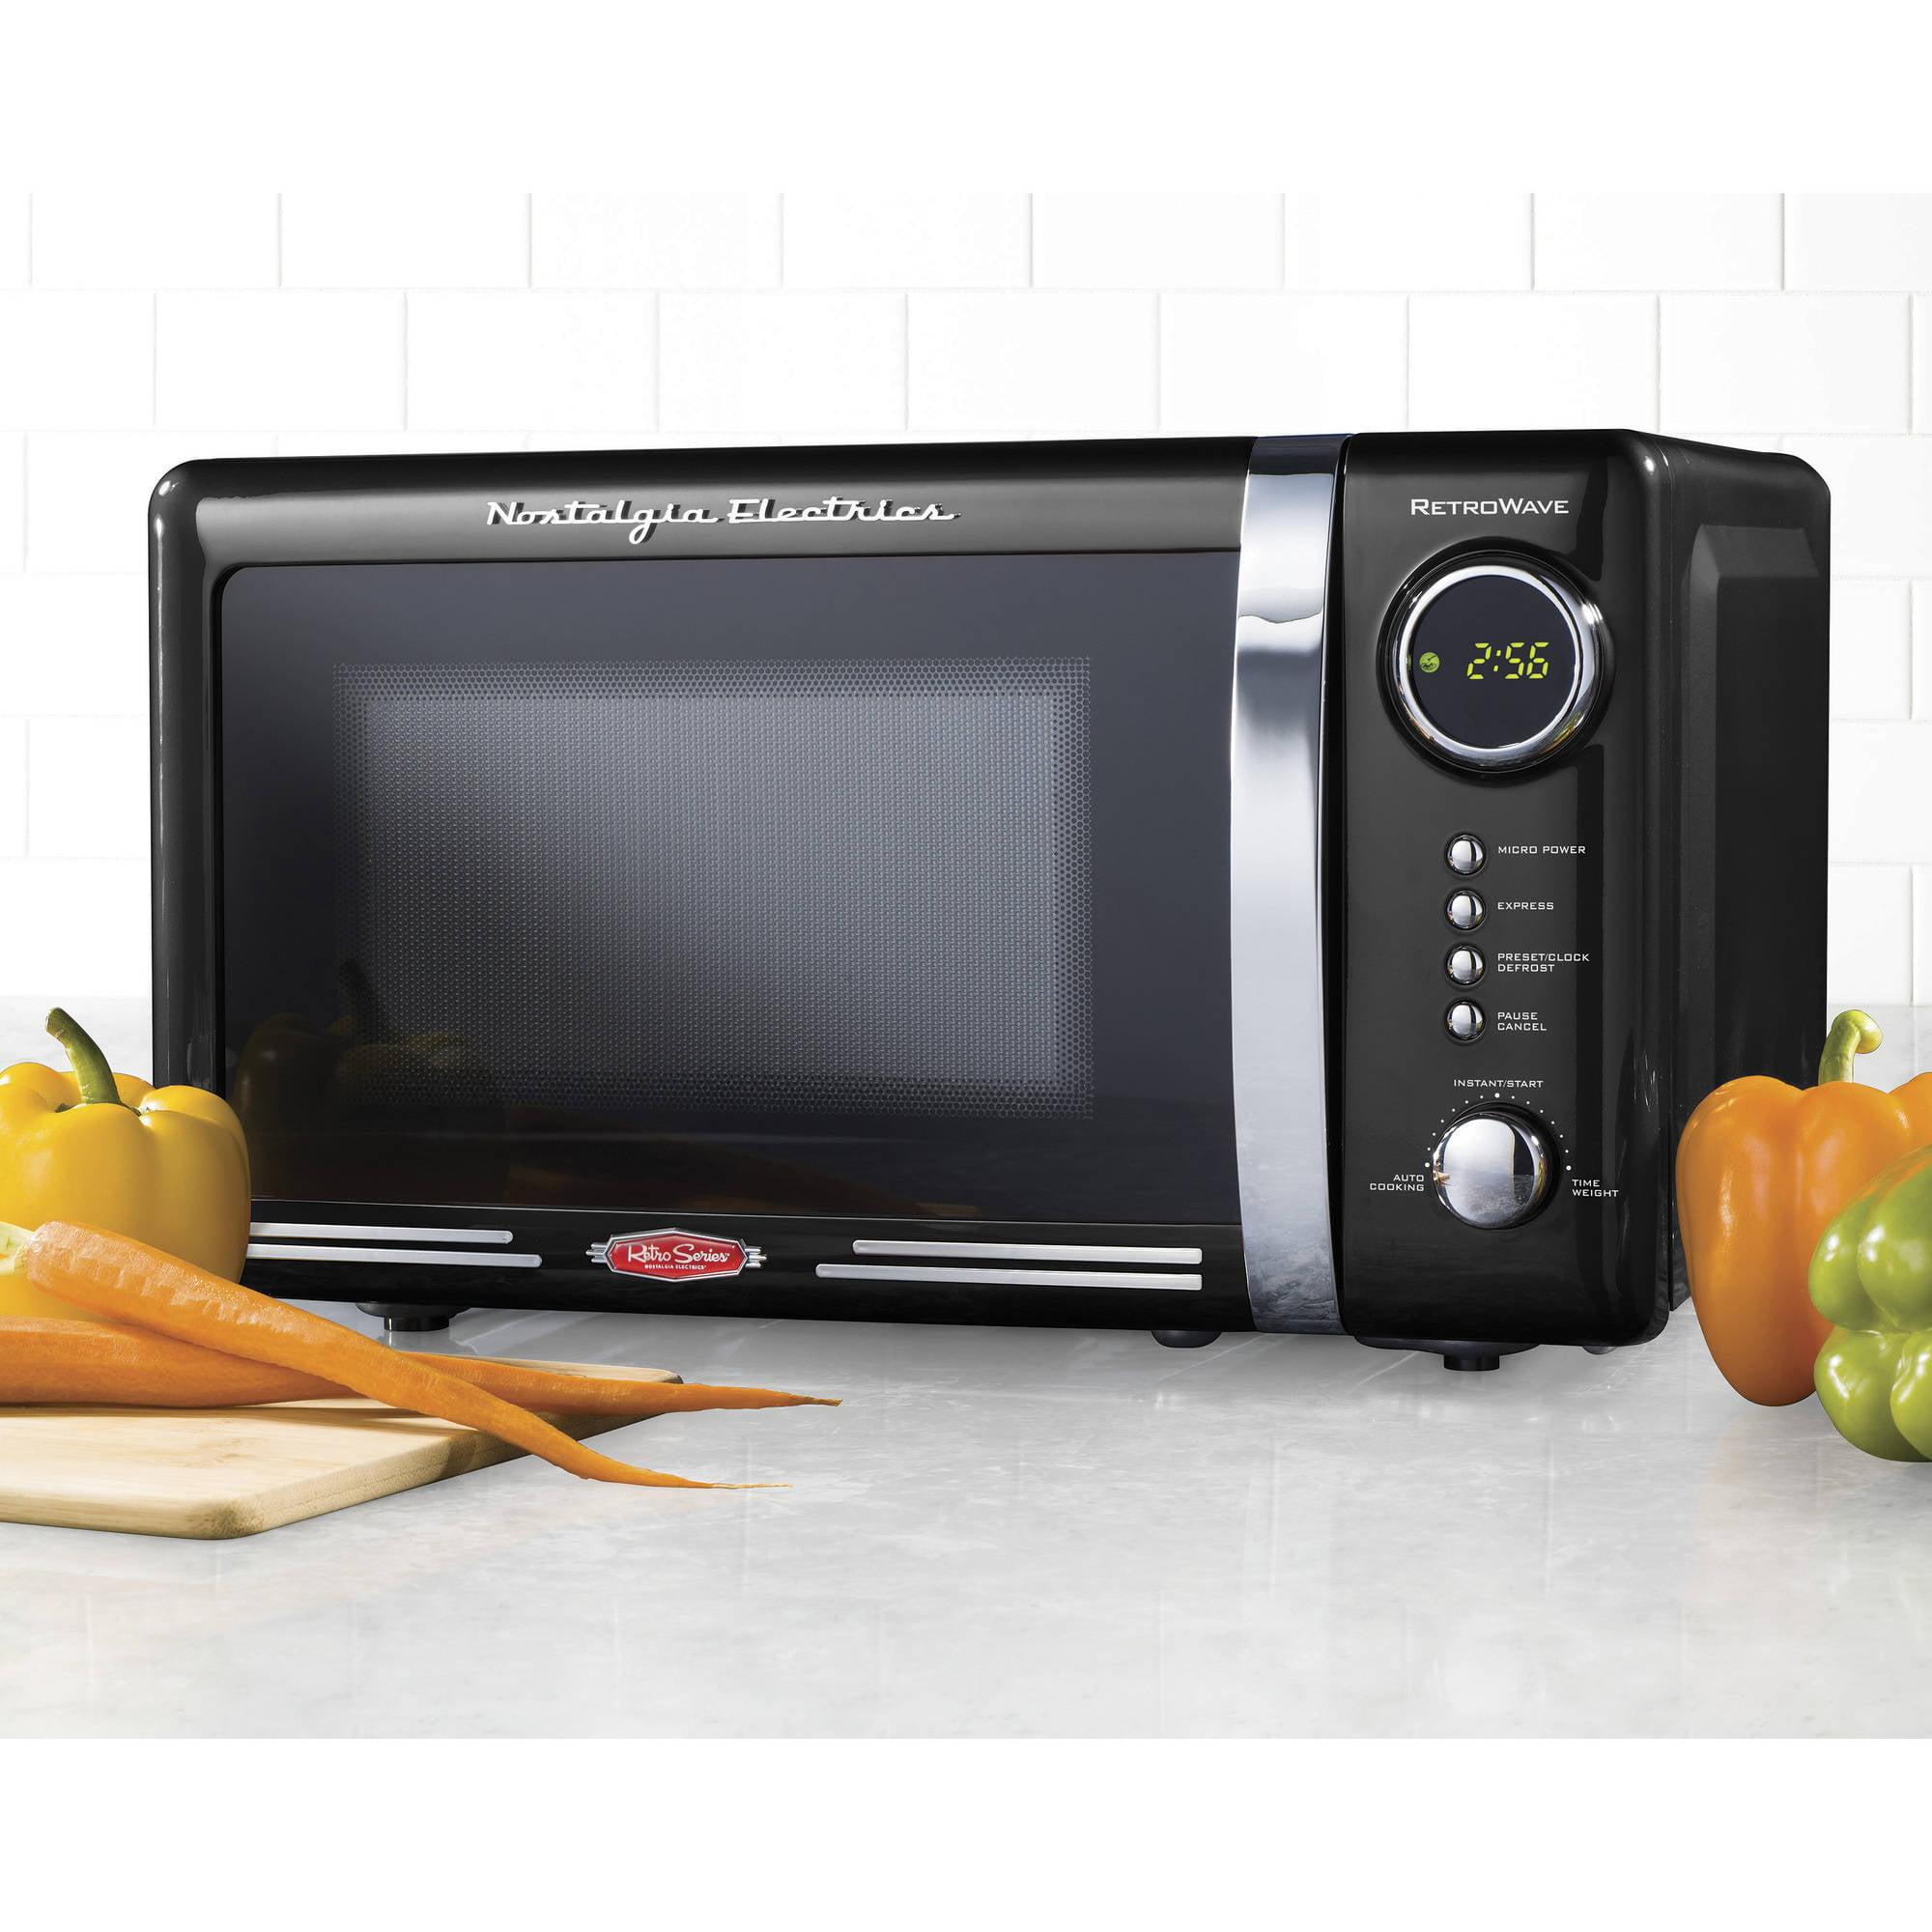 Nostalgia Rmo770blk Retro Series 0 7 Cu Ft 700w Microwave Oven